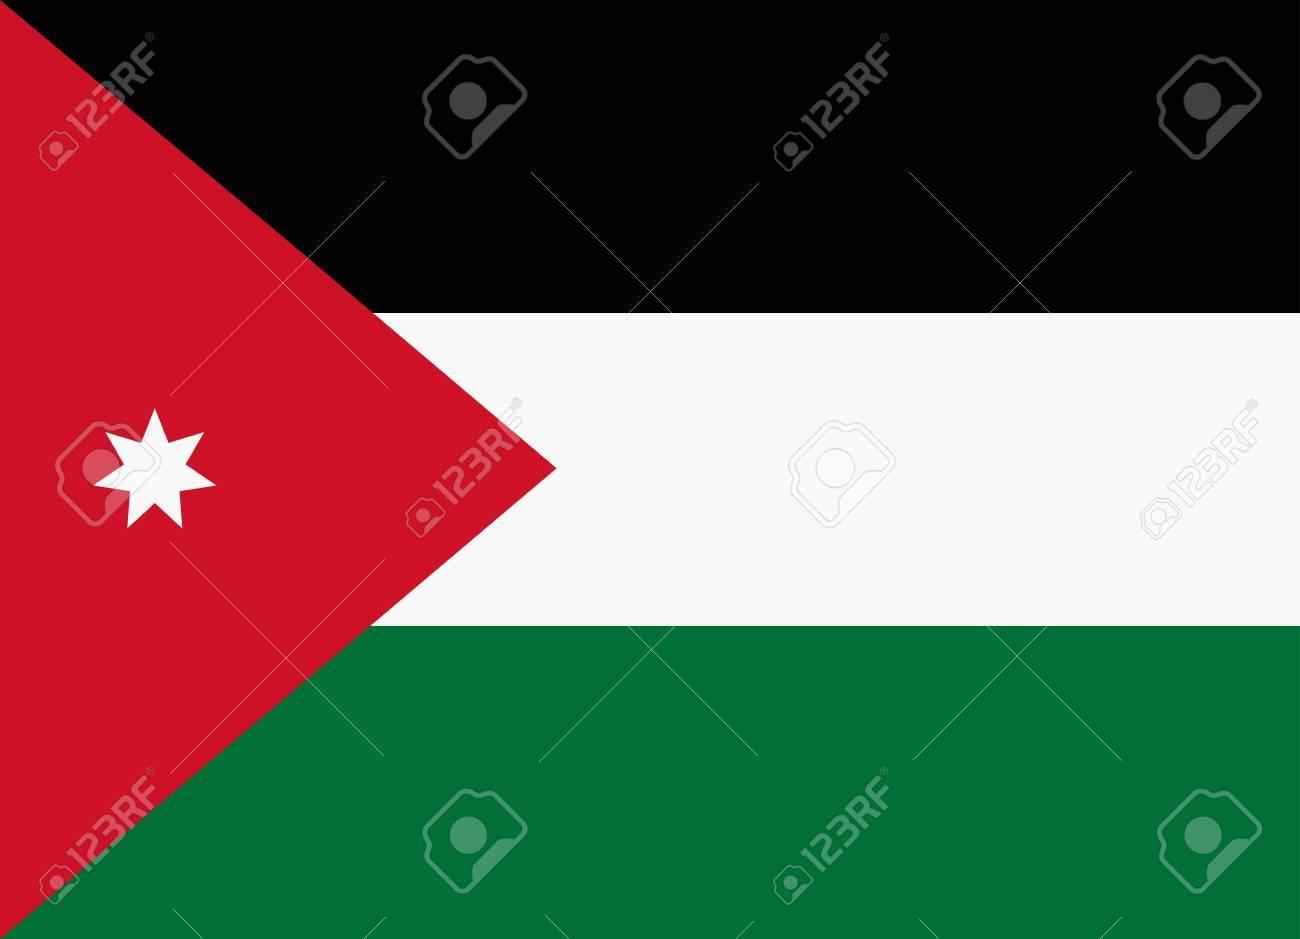 flag of jordan royalty free cliparts vectors and stock